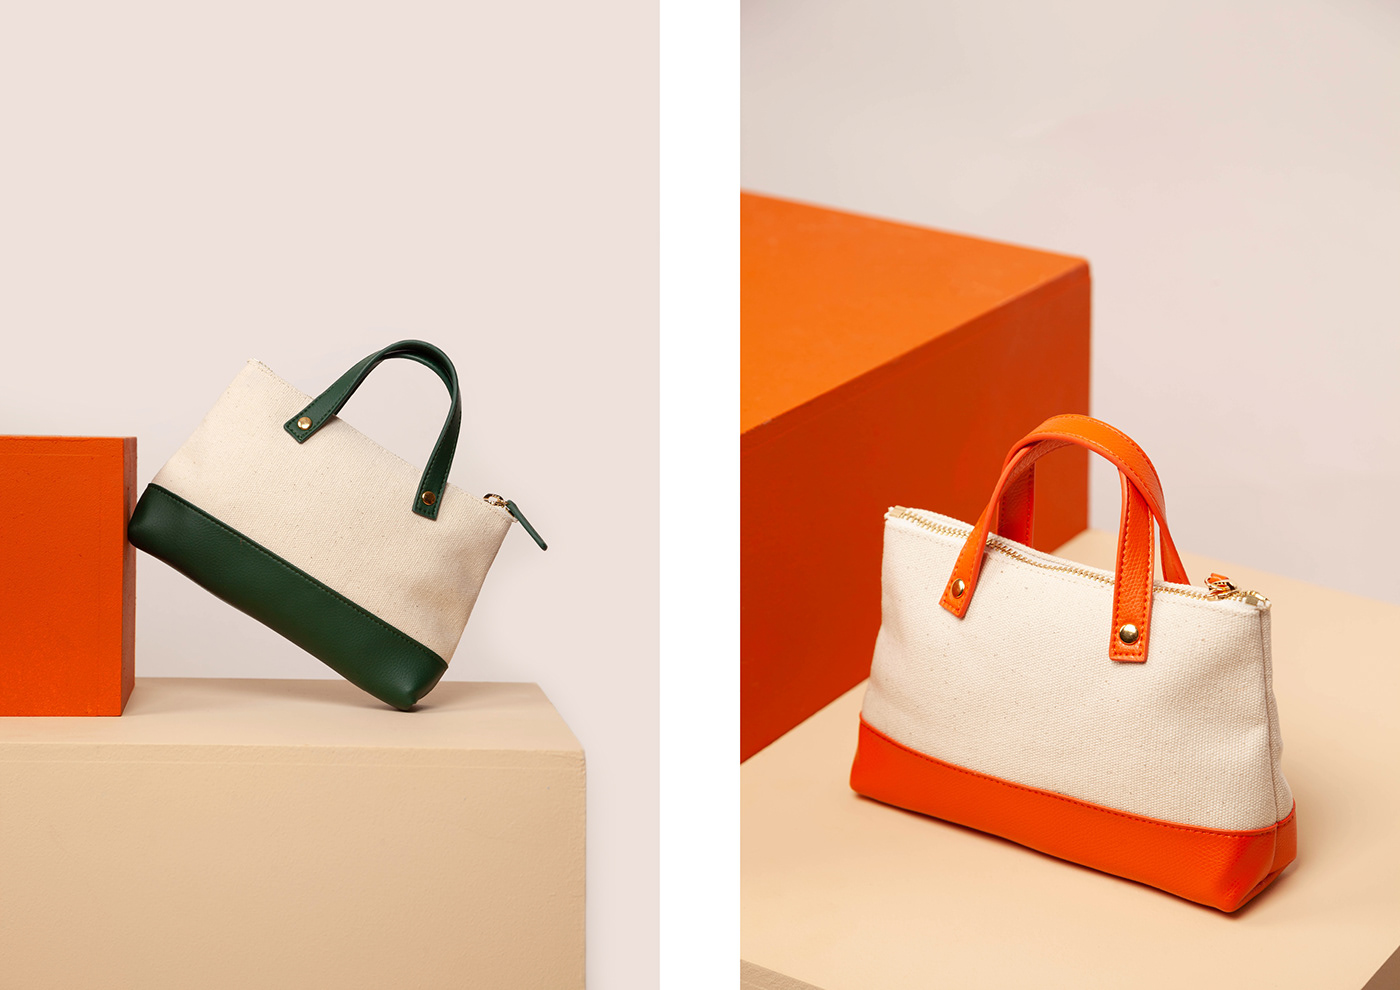 Image may contain: handbag, luggage and bags and orange